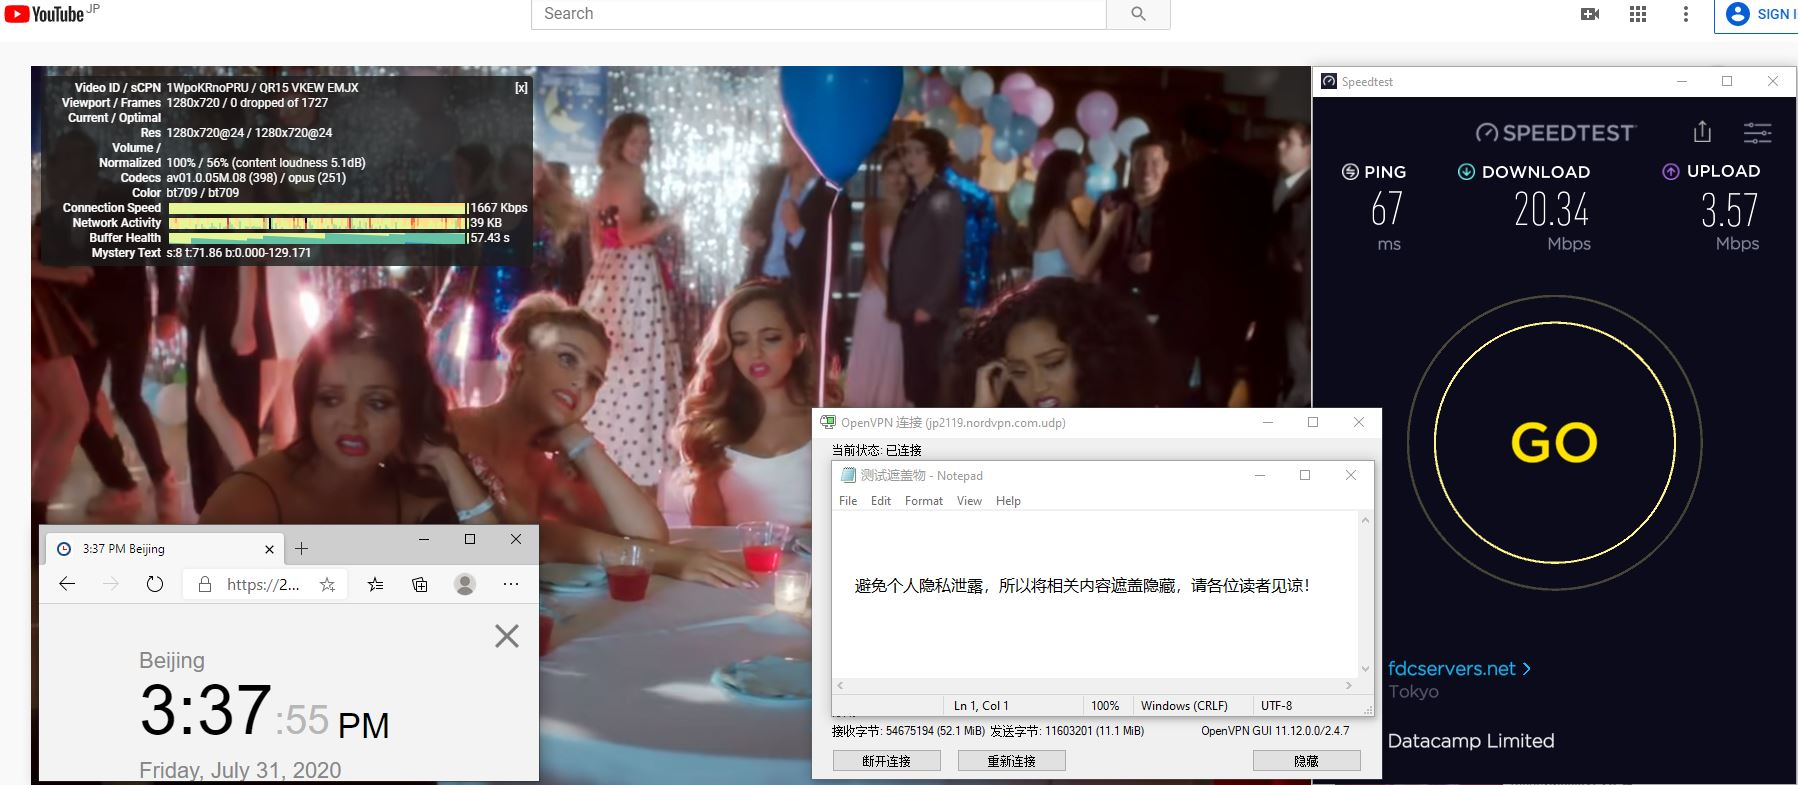 Windows10 NordVPN Openvpn jp2119 中国VPN 翻墙 科学上网 翻墙速度测试 - 20200731